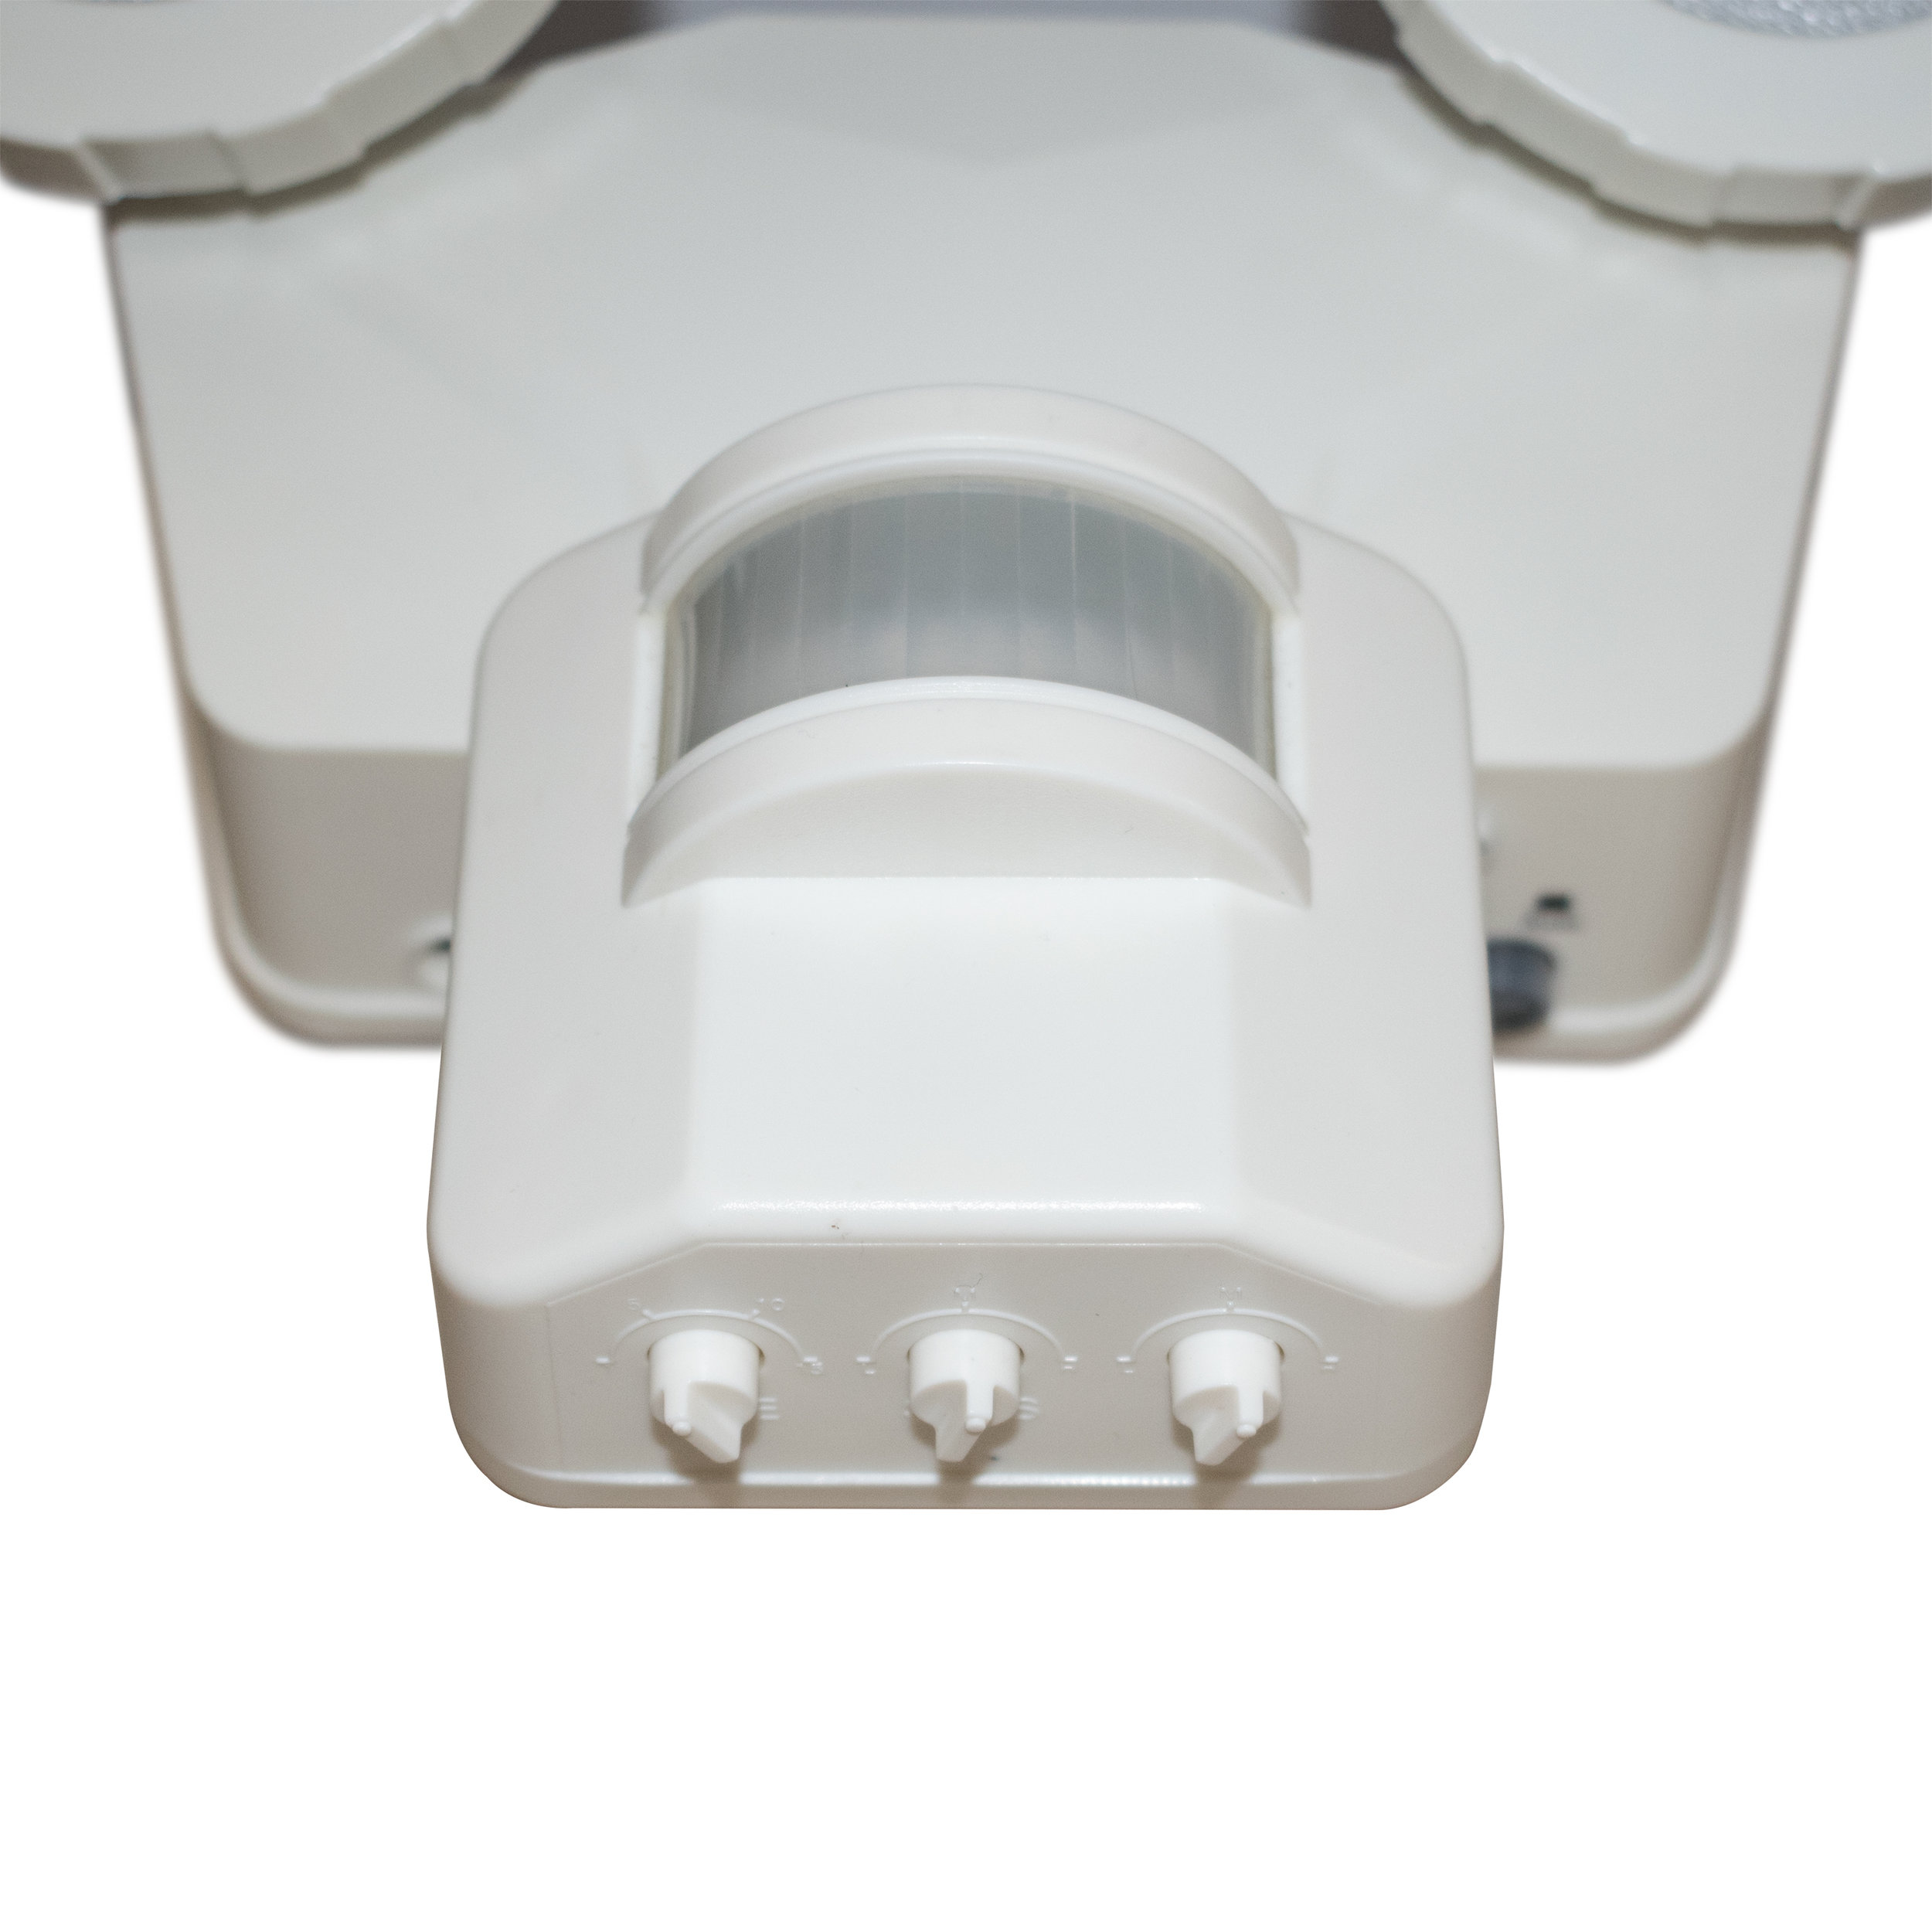 Novolink NL-DSW2 Solar Security Light, Motion Sensor detail